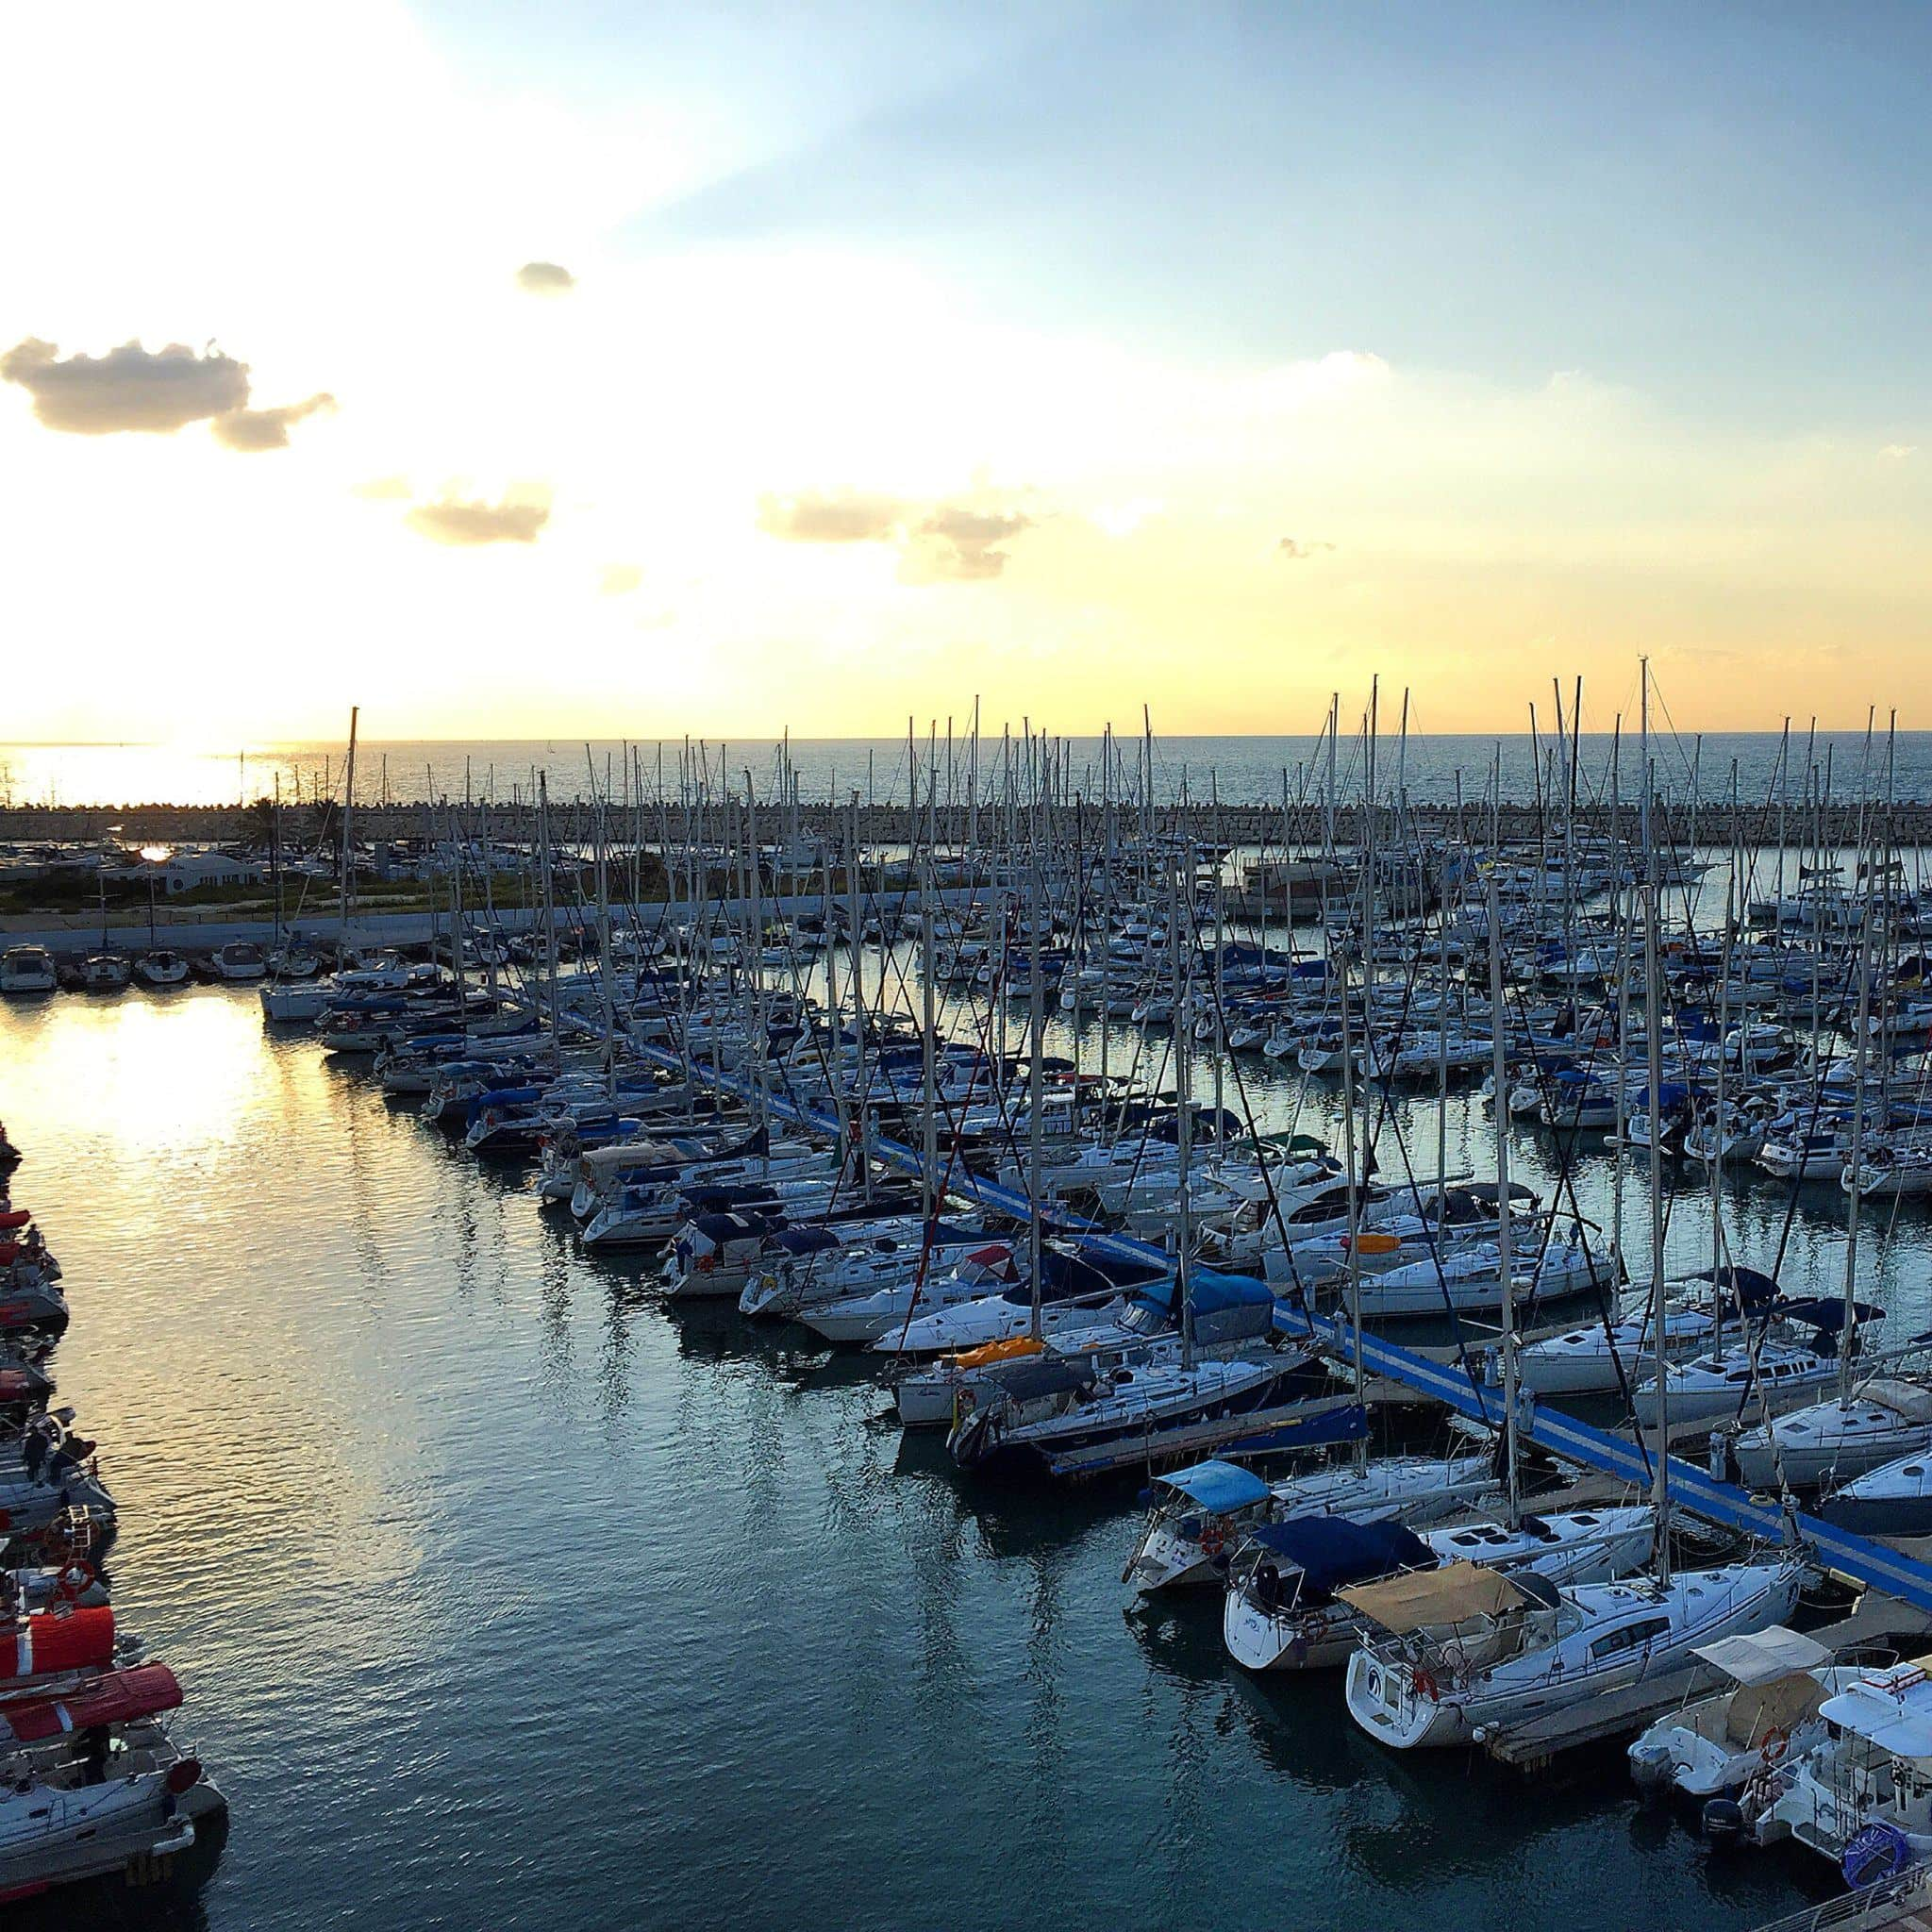 View of the Mediterranean Sea from the Ritz-Carlton Herzilya